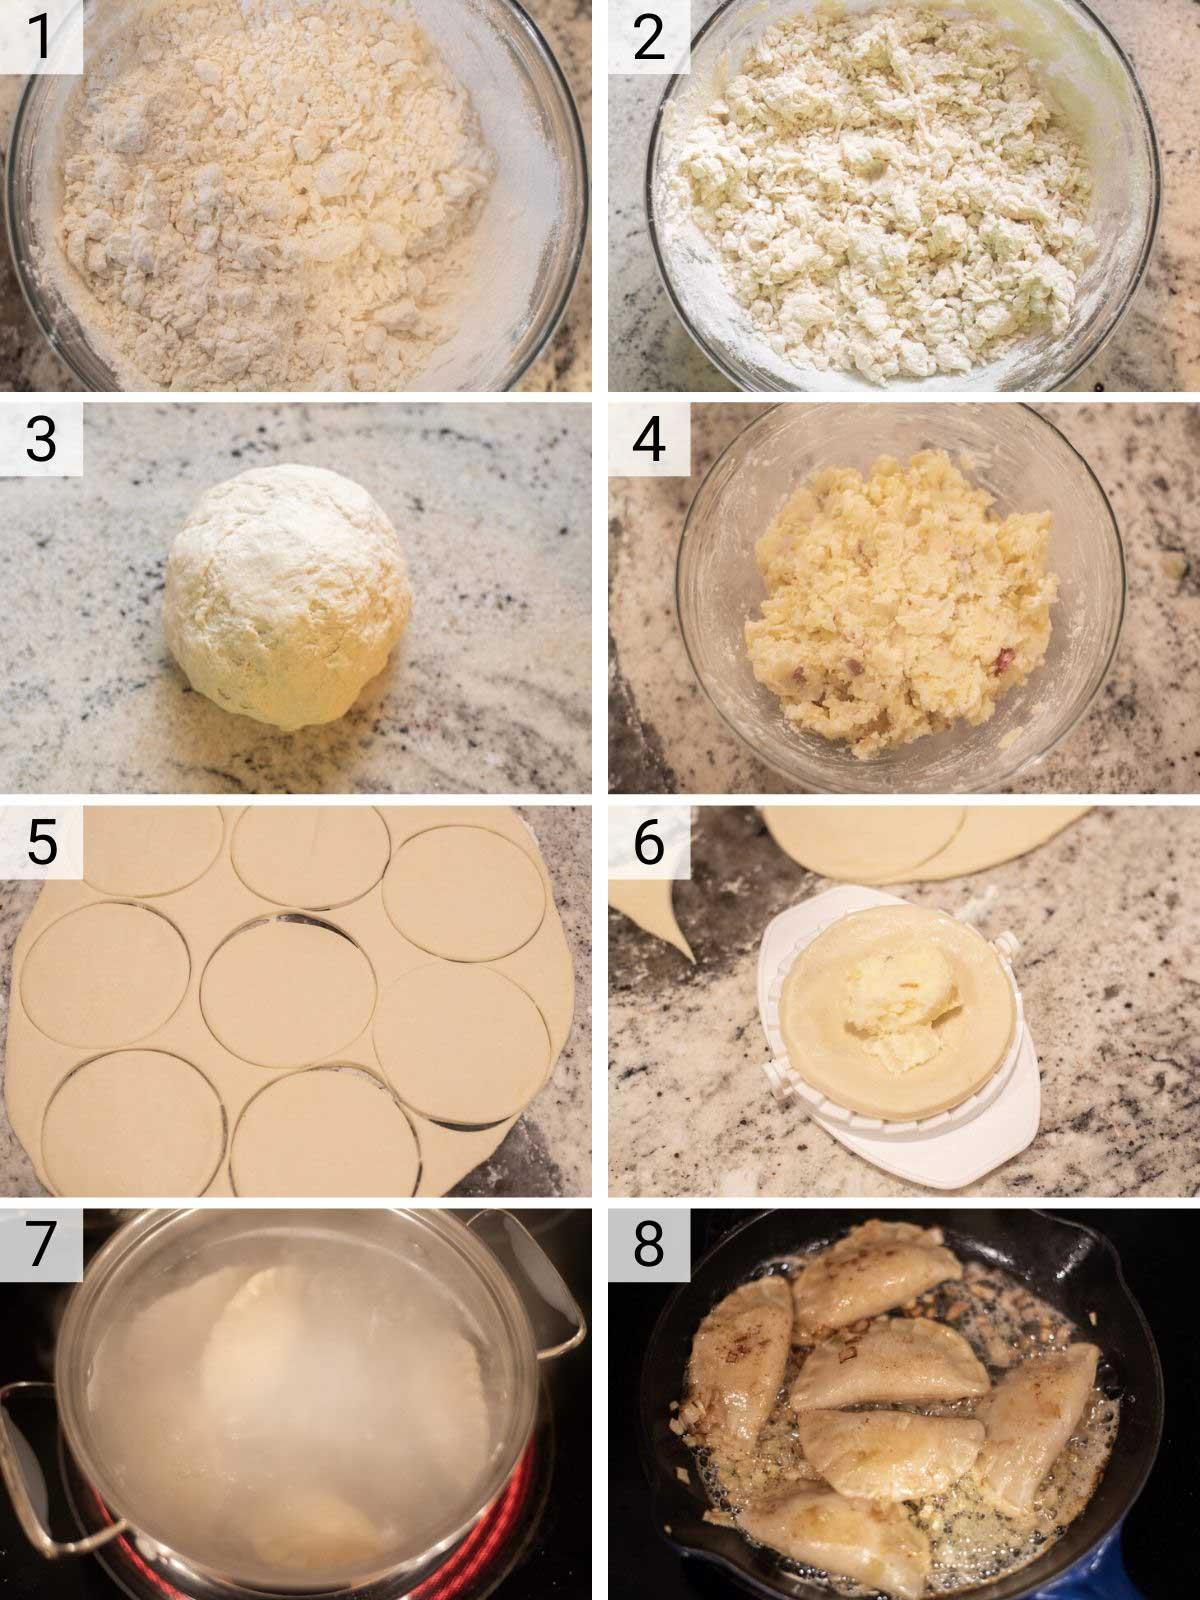 process shots of how to make homemade pieroigies